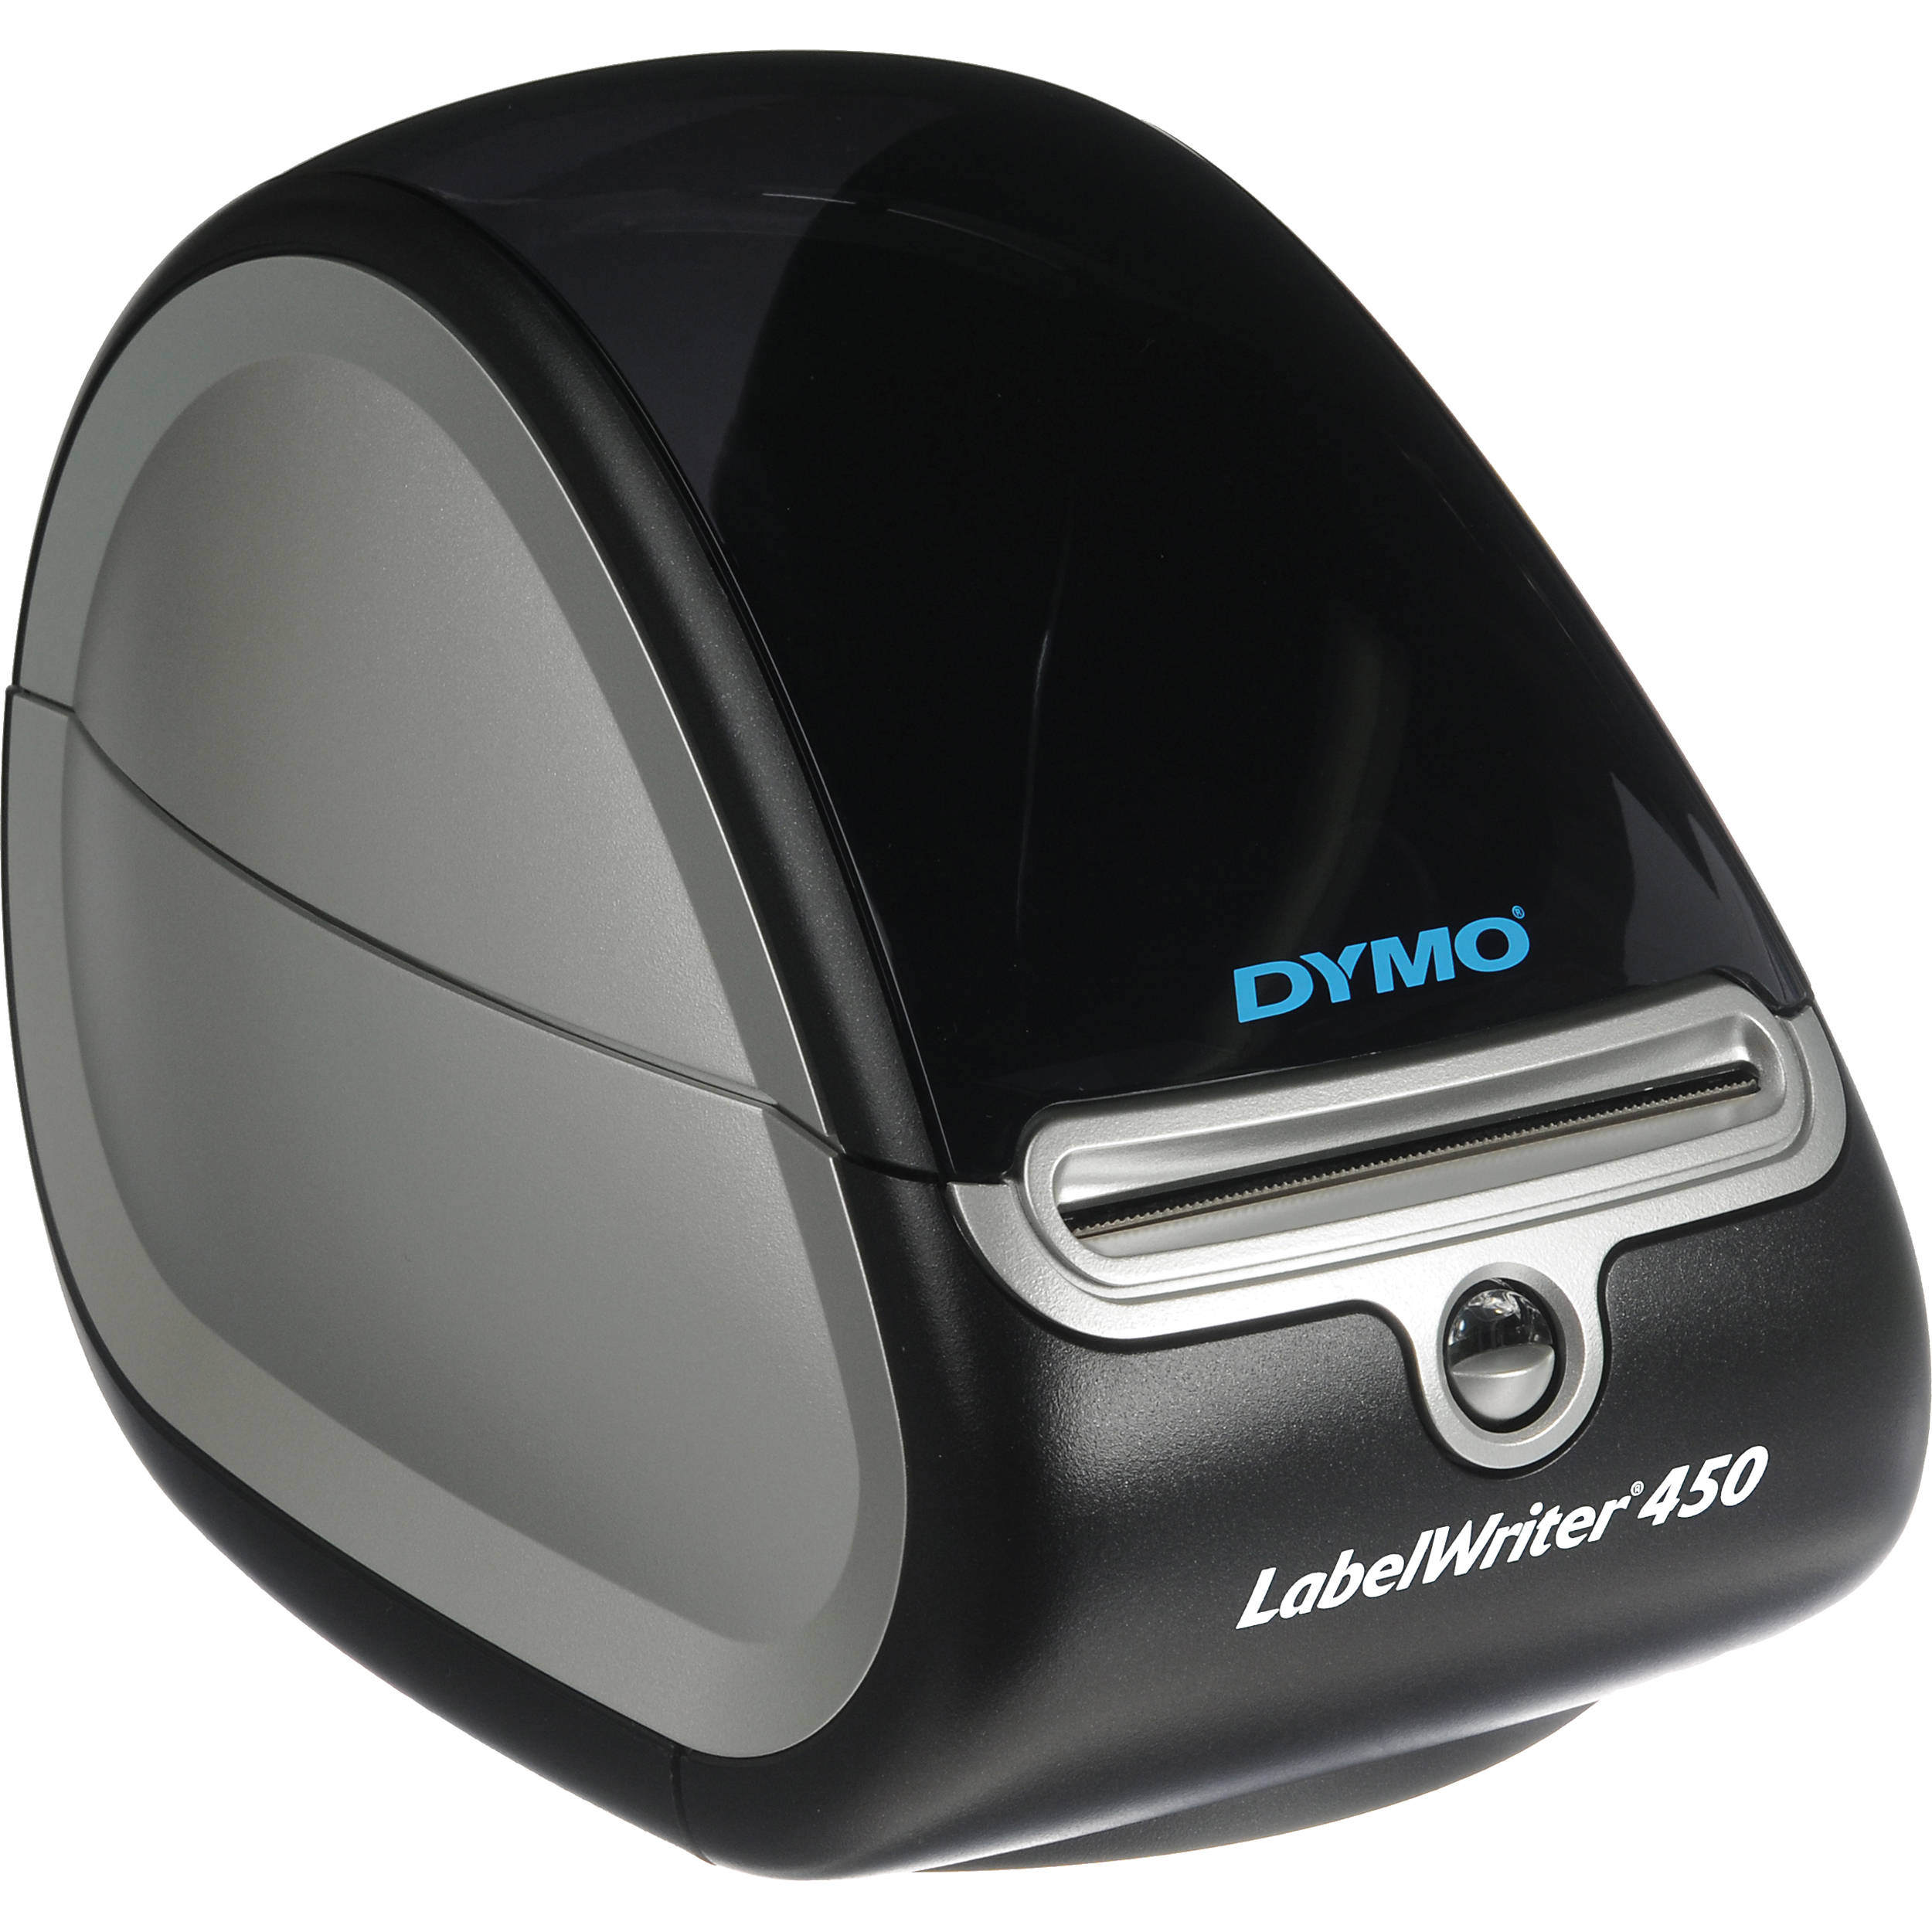 Dymo Labelwriter Usb Label